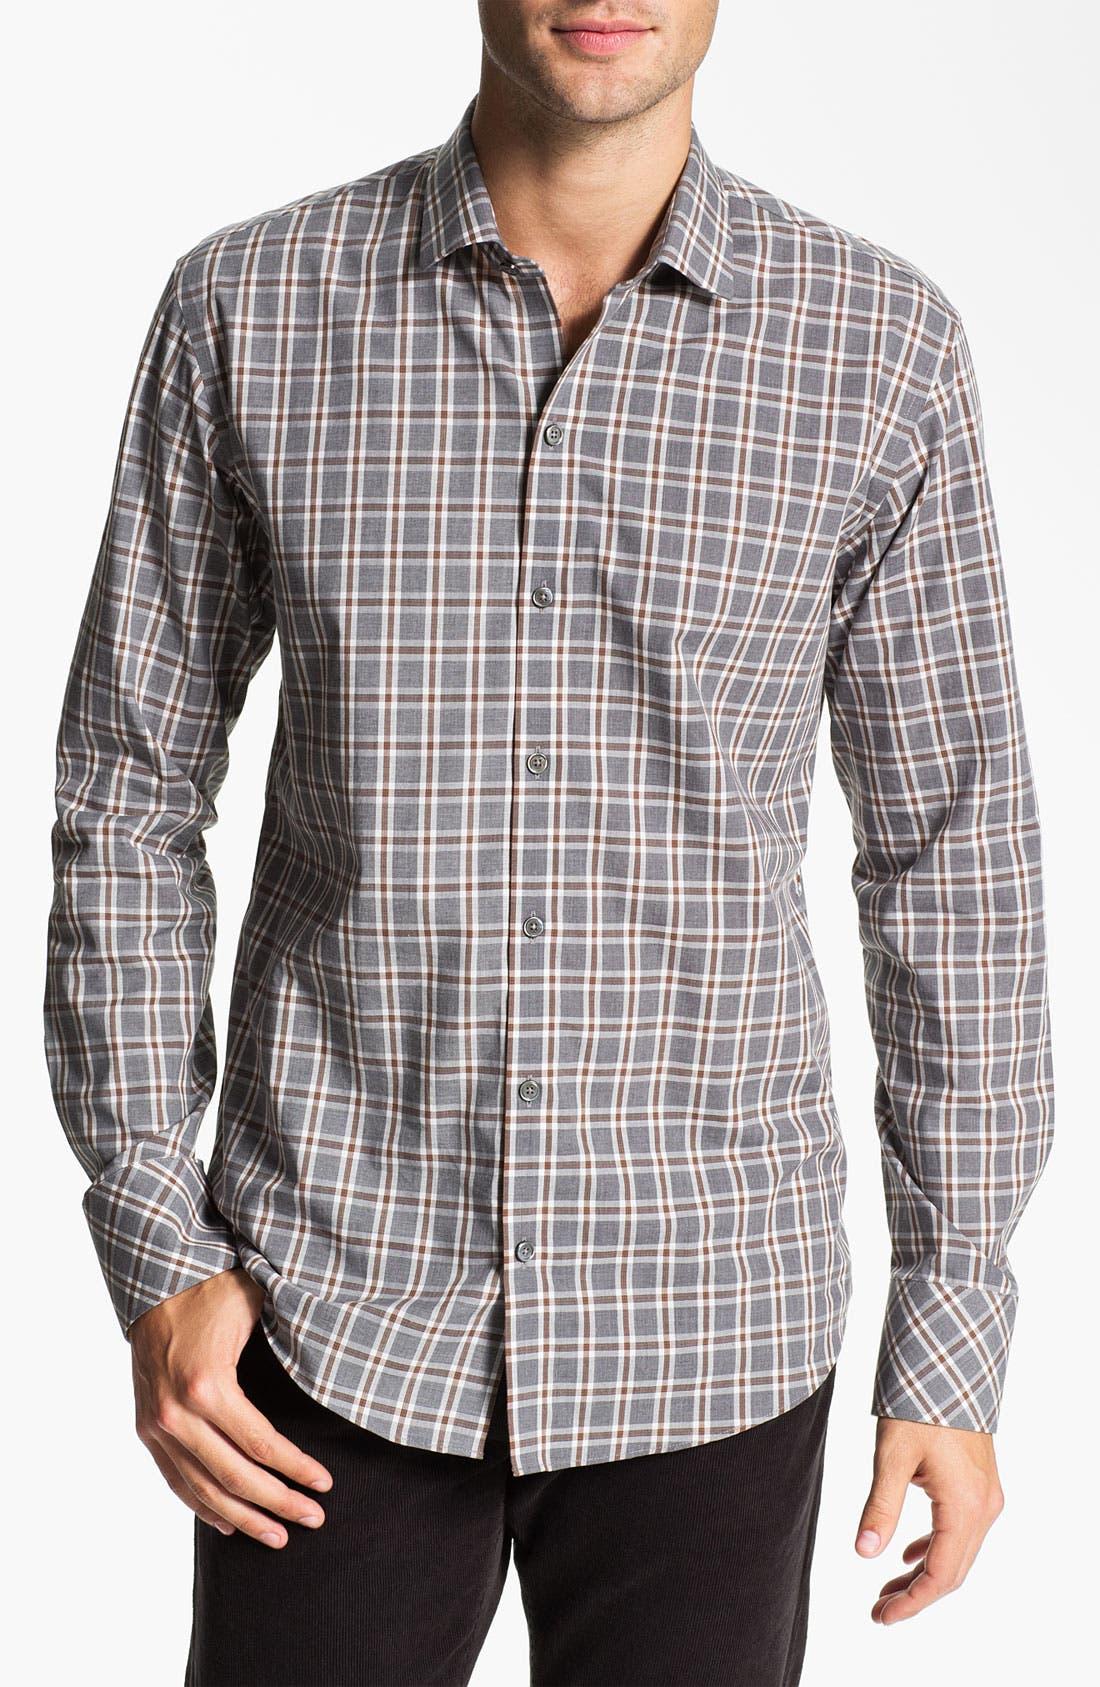 Alternate Image 1 Selected - Zachary Prell 'Gaiser' Sport Shirt